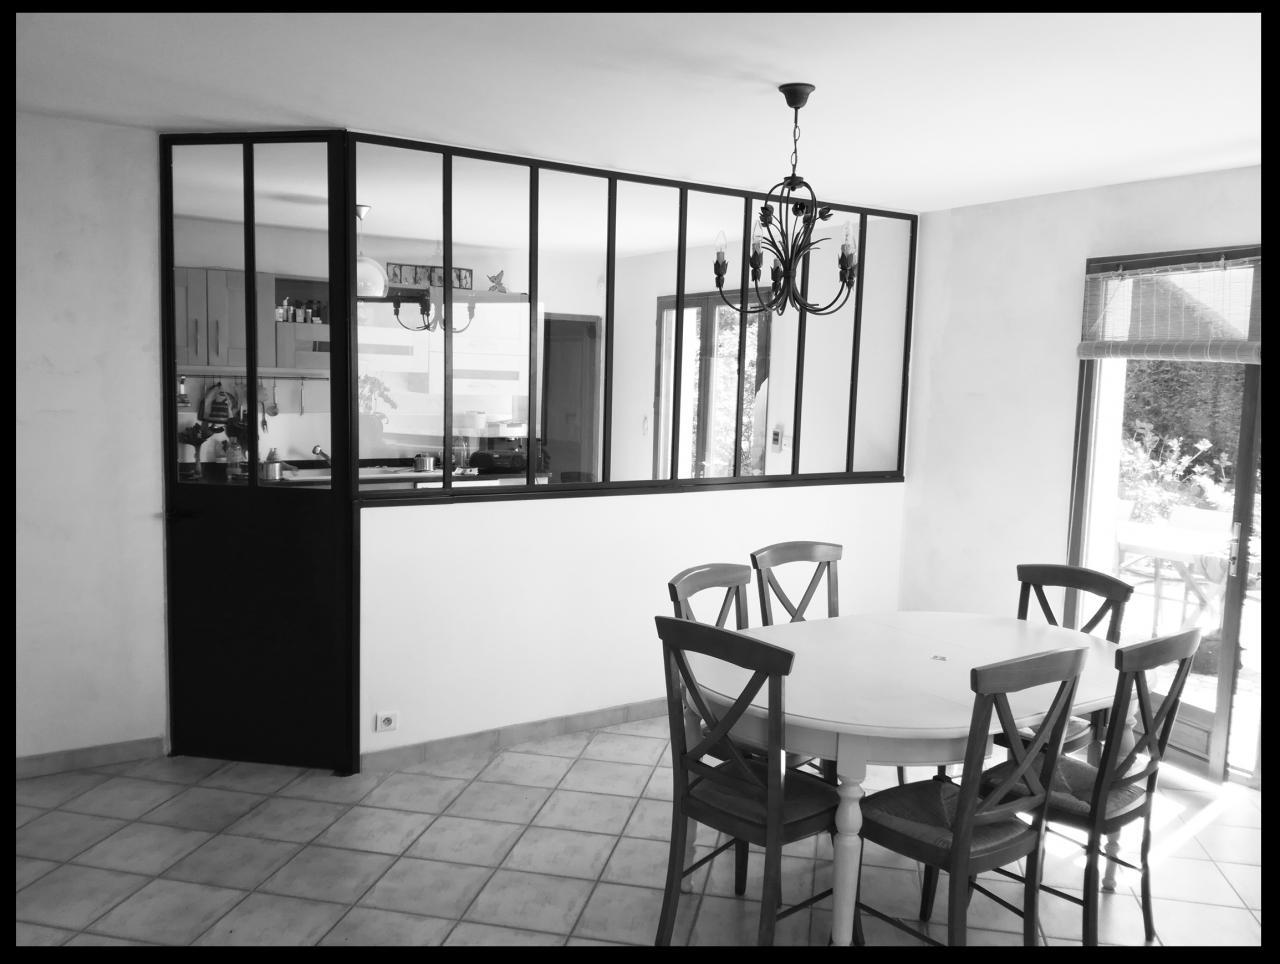 cadre photo industriel beautiful porte coulissante en aluminium semivitre clipper with cadre. Black Bedroom Furniture Sets. Home Design Ideas